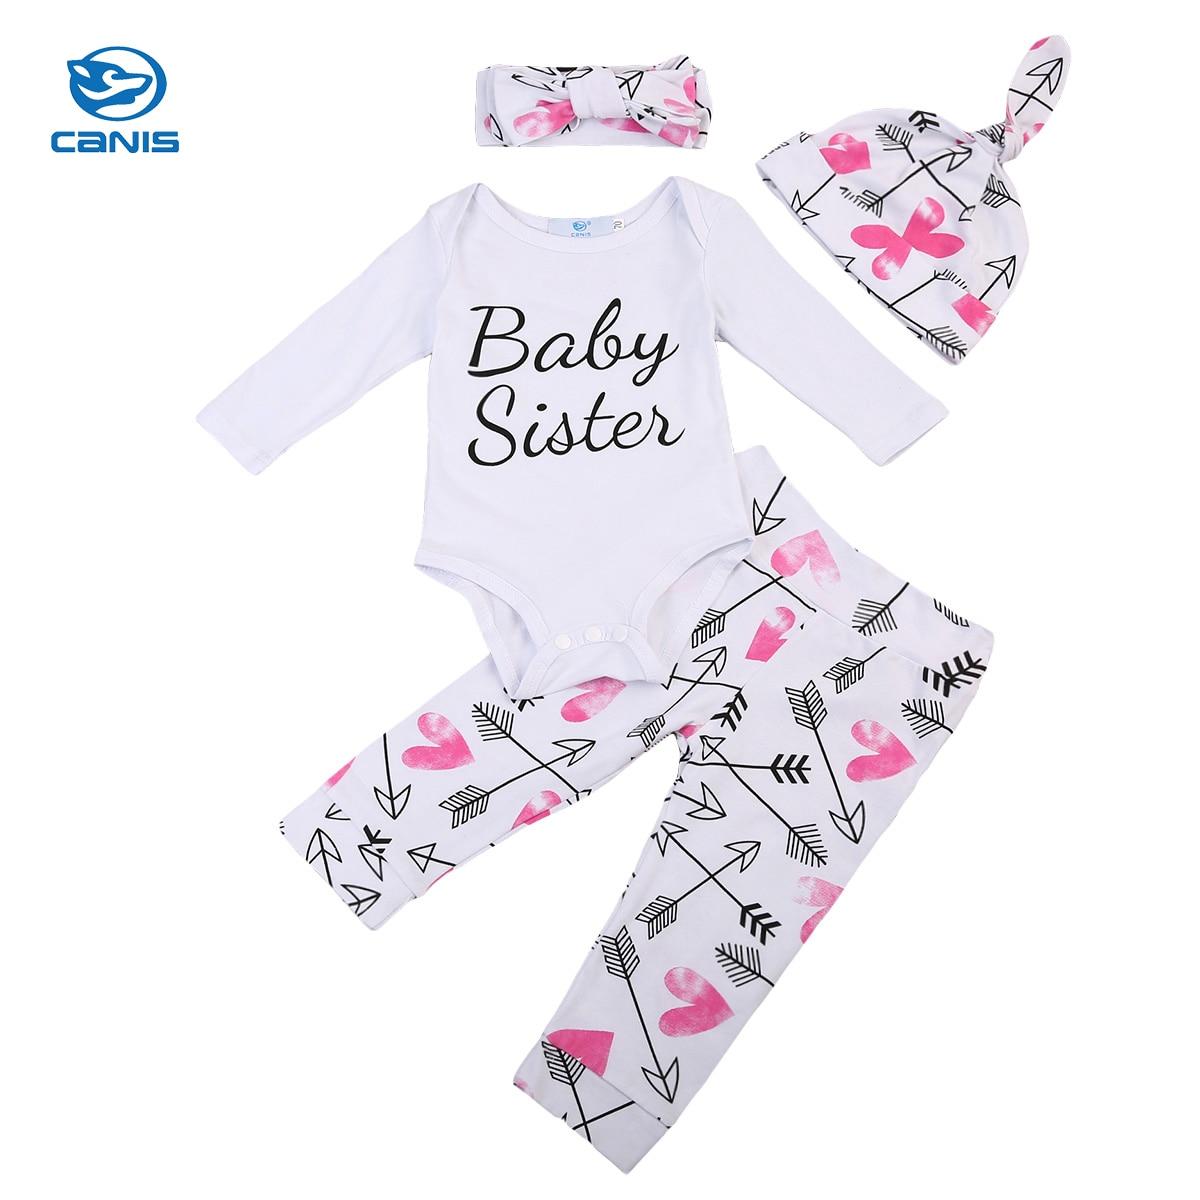 4PCS Newborn Infant Baby Girls Long Sleeve Romper Bodysuit Floral Pants Outfits Baby Set Autumn